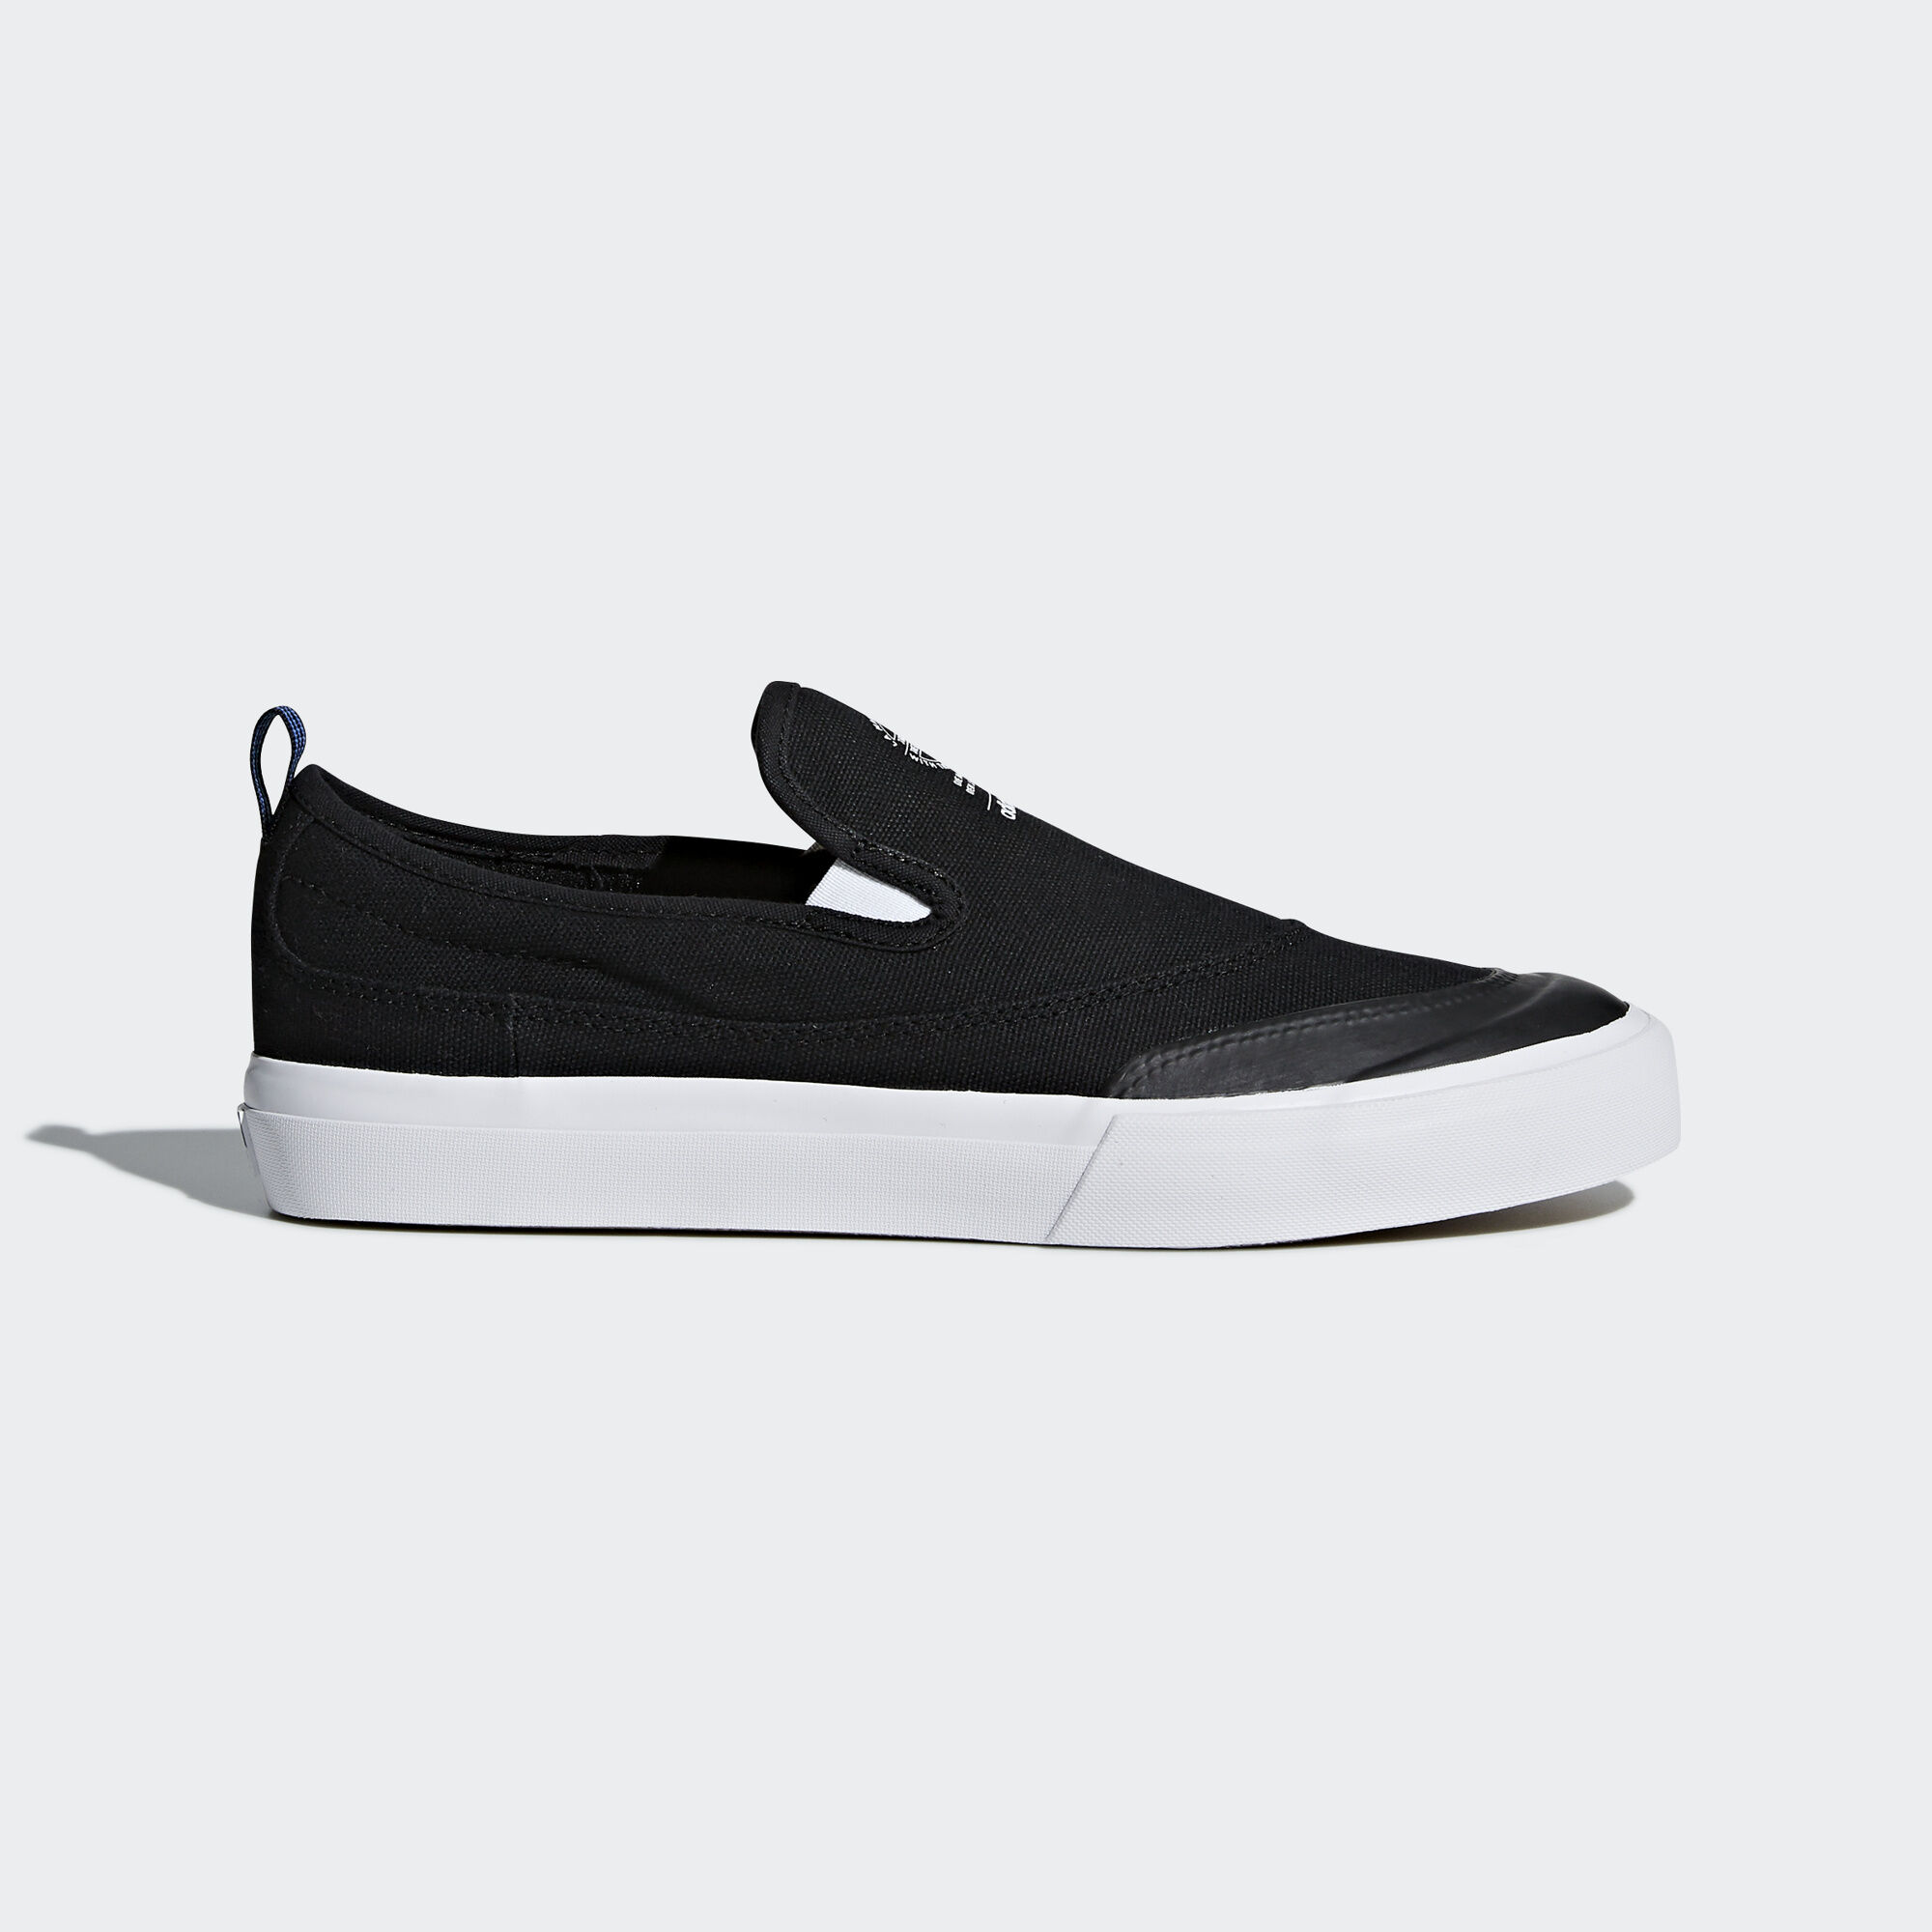 adidas Skateboarding Matchcourt Chaussure - core black white gum MawKRgzaN